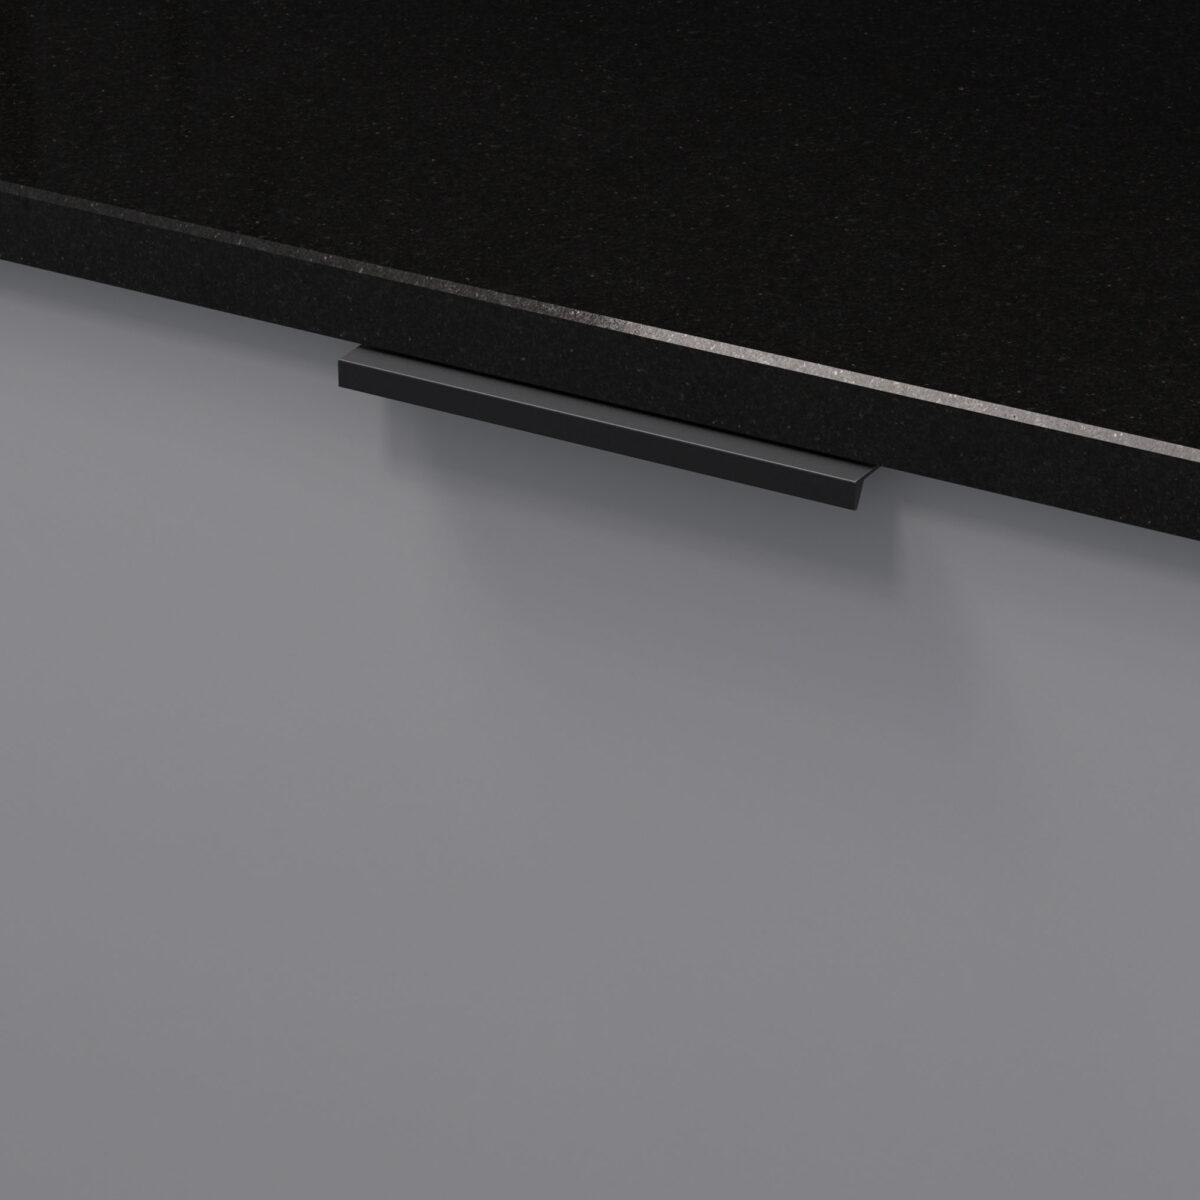 Profilhandtag slim 4025 matt svart 305176 11 136 mm ncs s 4500 n granit svart